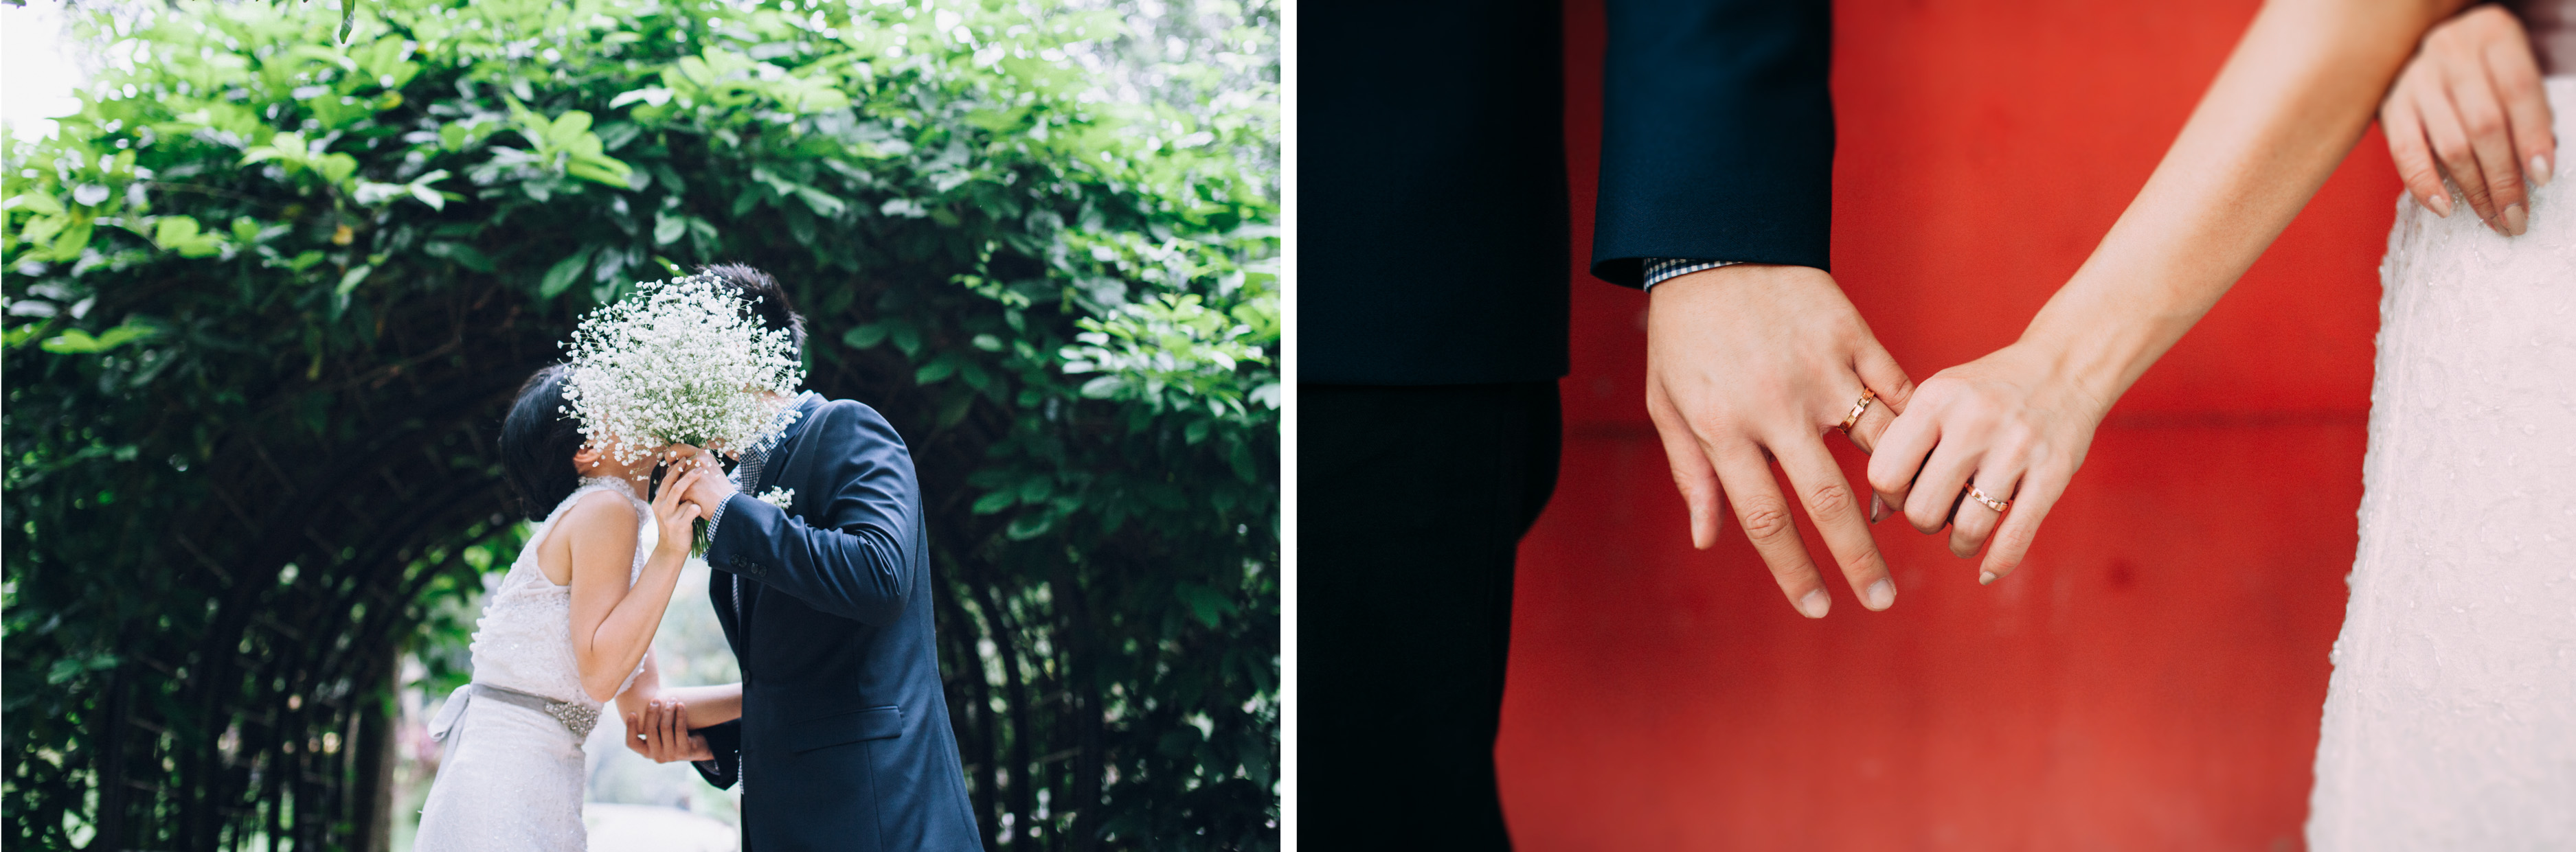 3-hellojanelee-malaysia-wedding-photographer-lake-garden-tinajackson-prewedding